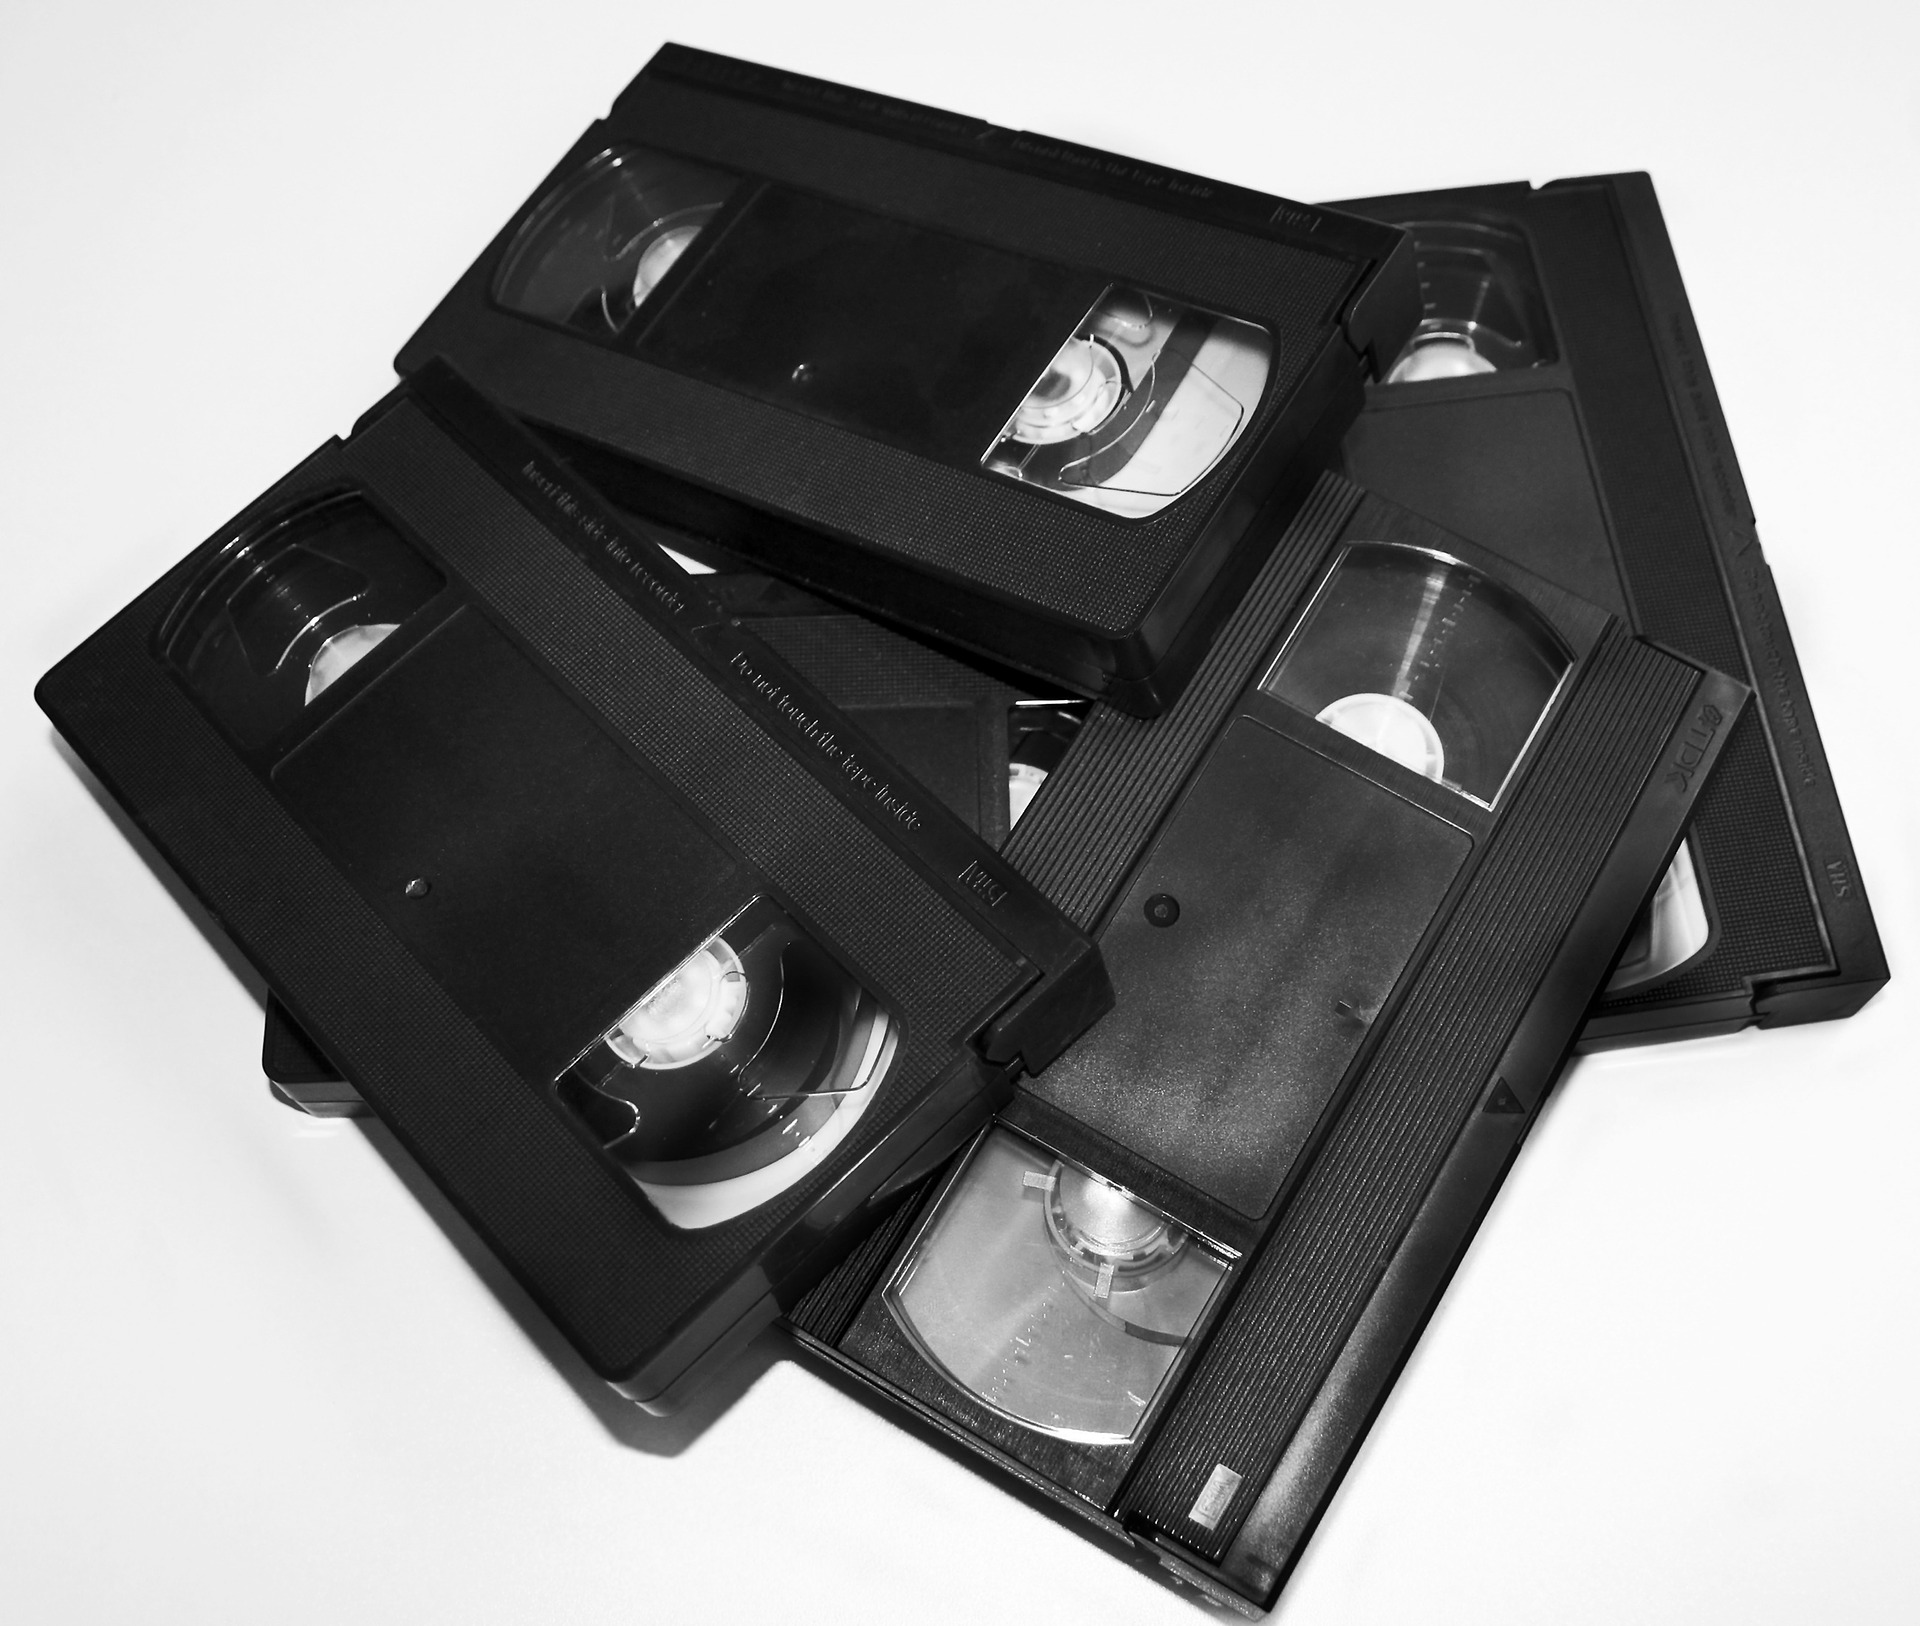 Videokassetten digitalisieren lassen im Saarland